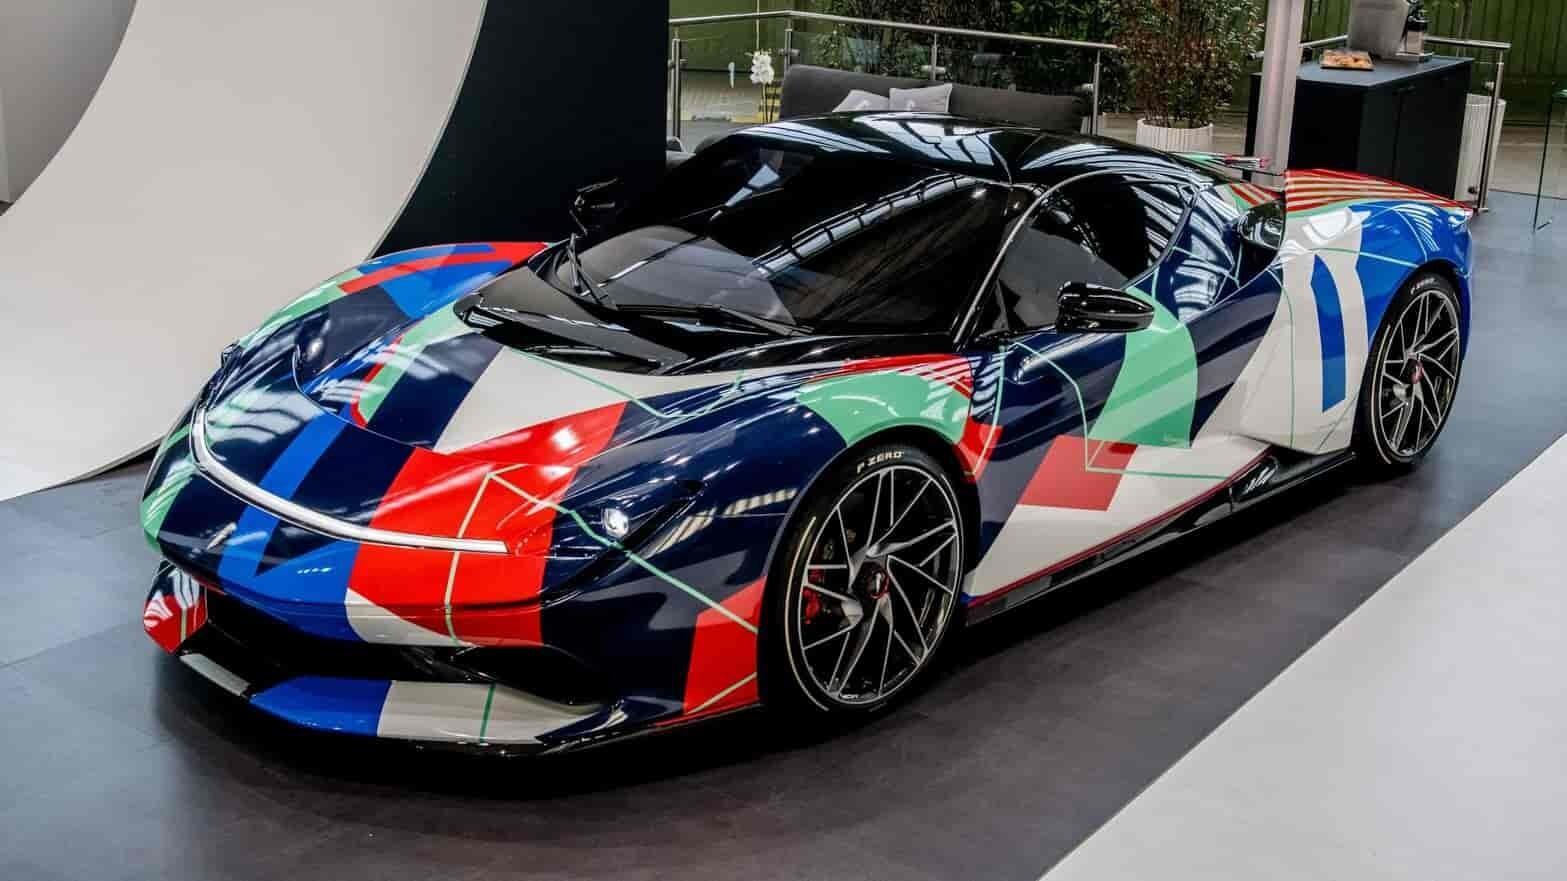 Look at this one-off Pininfarina Battista